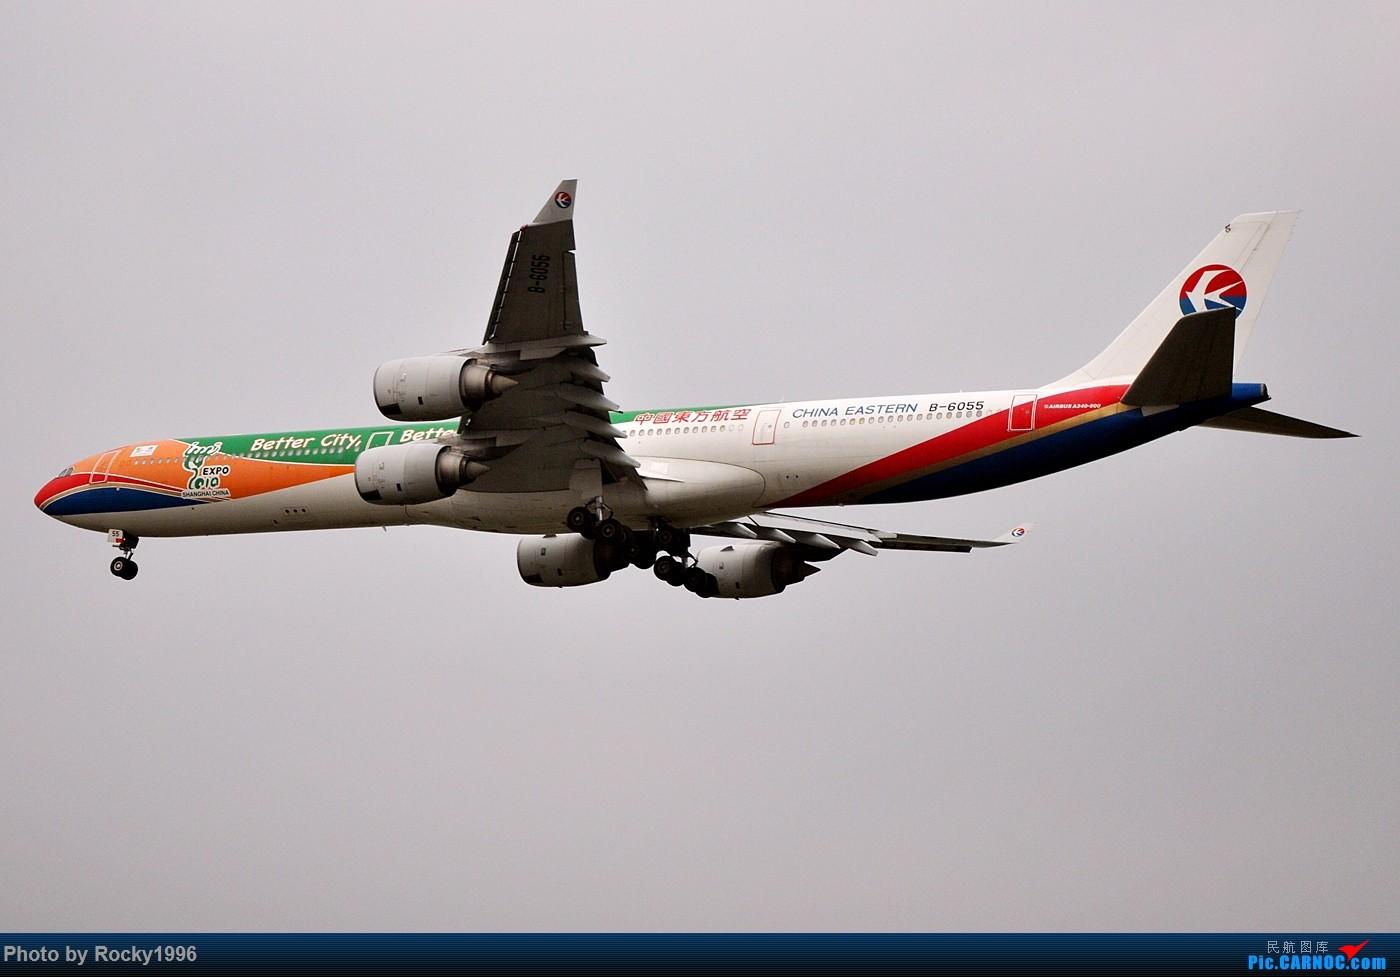 Re:一代传奇,终成历史,东航A340-600 B-6055 浦东机场落地 AIRBUS A340-600 B-6055 中国上海浦东国际机场